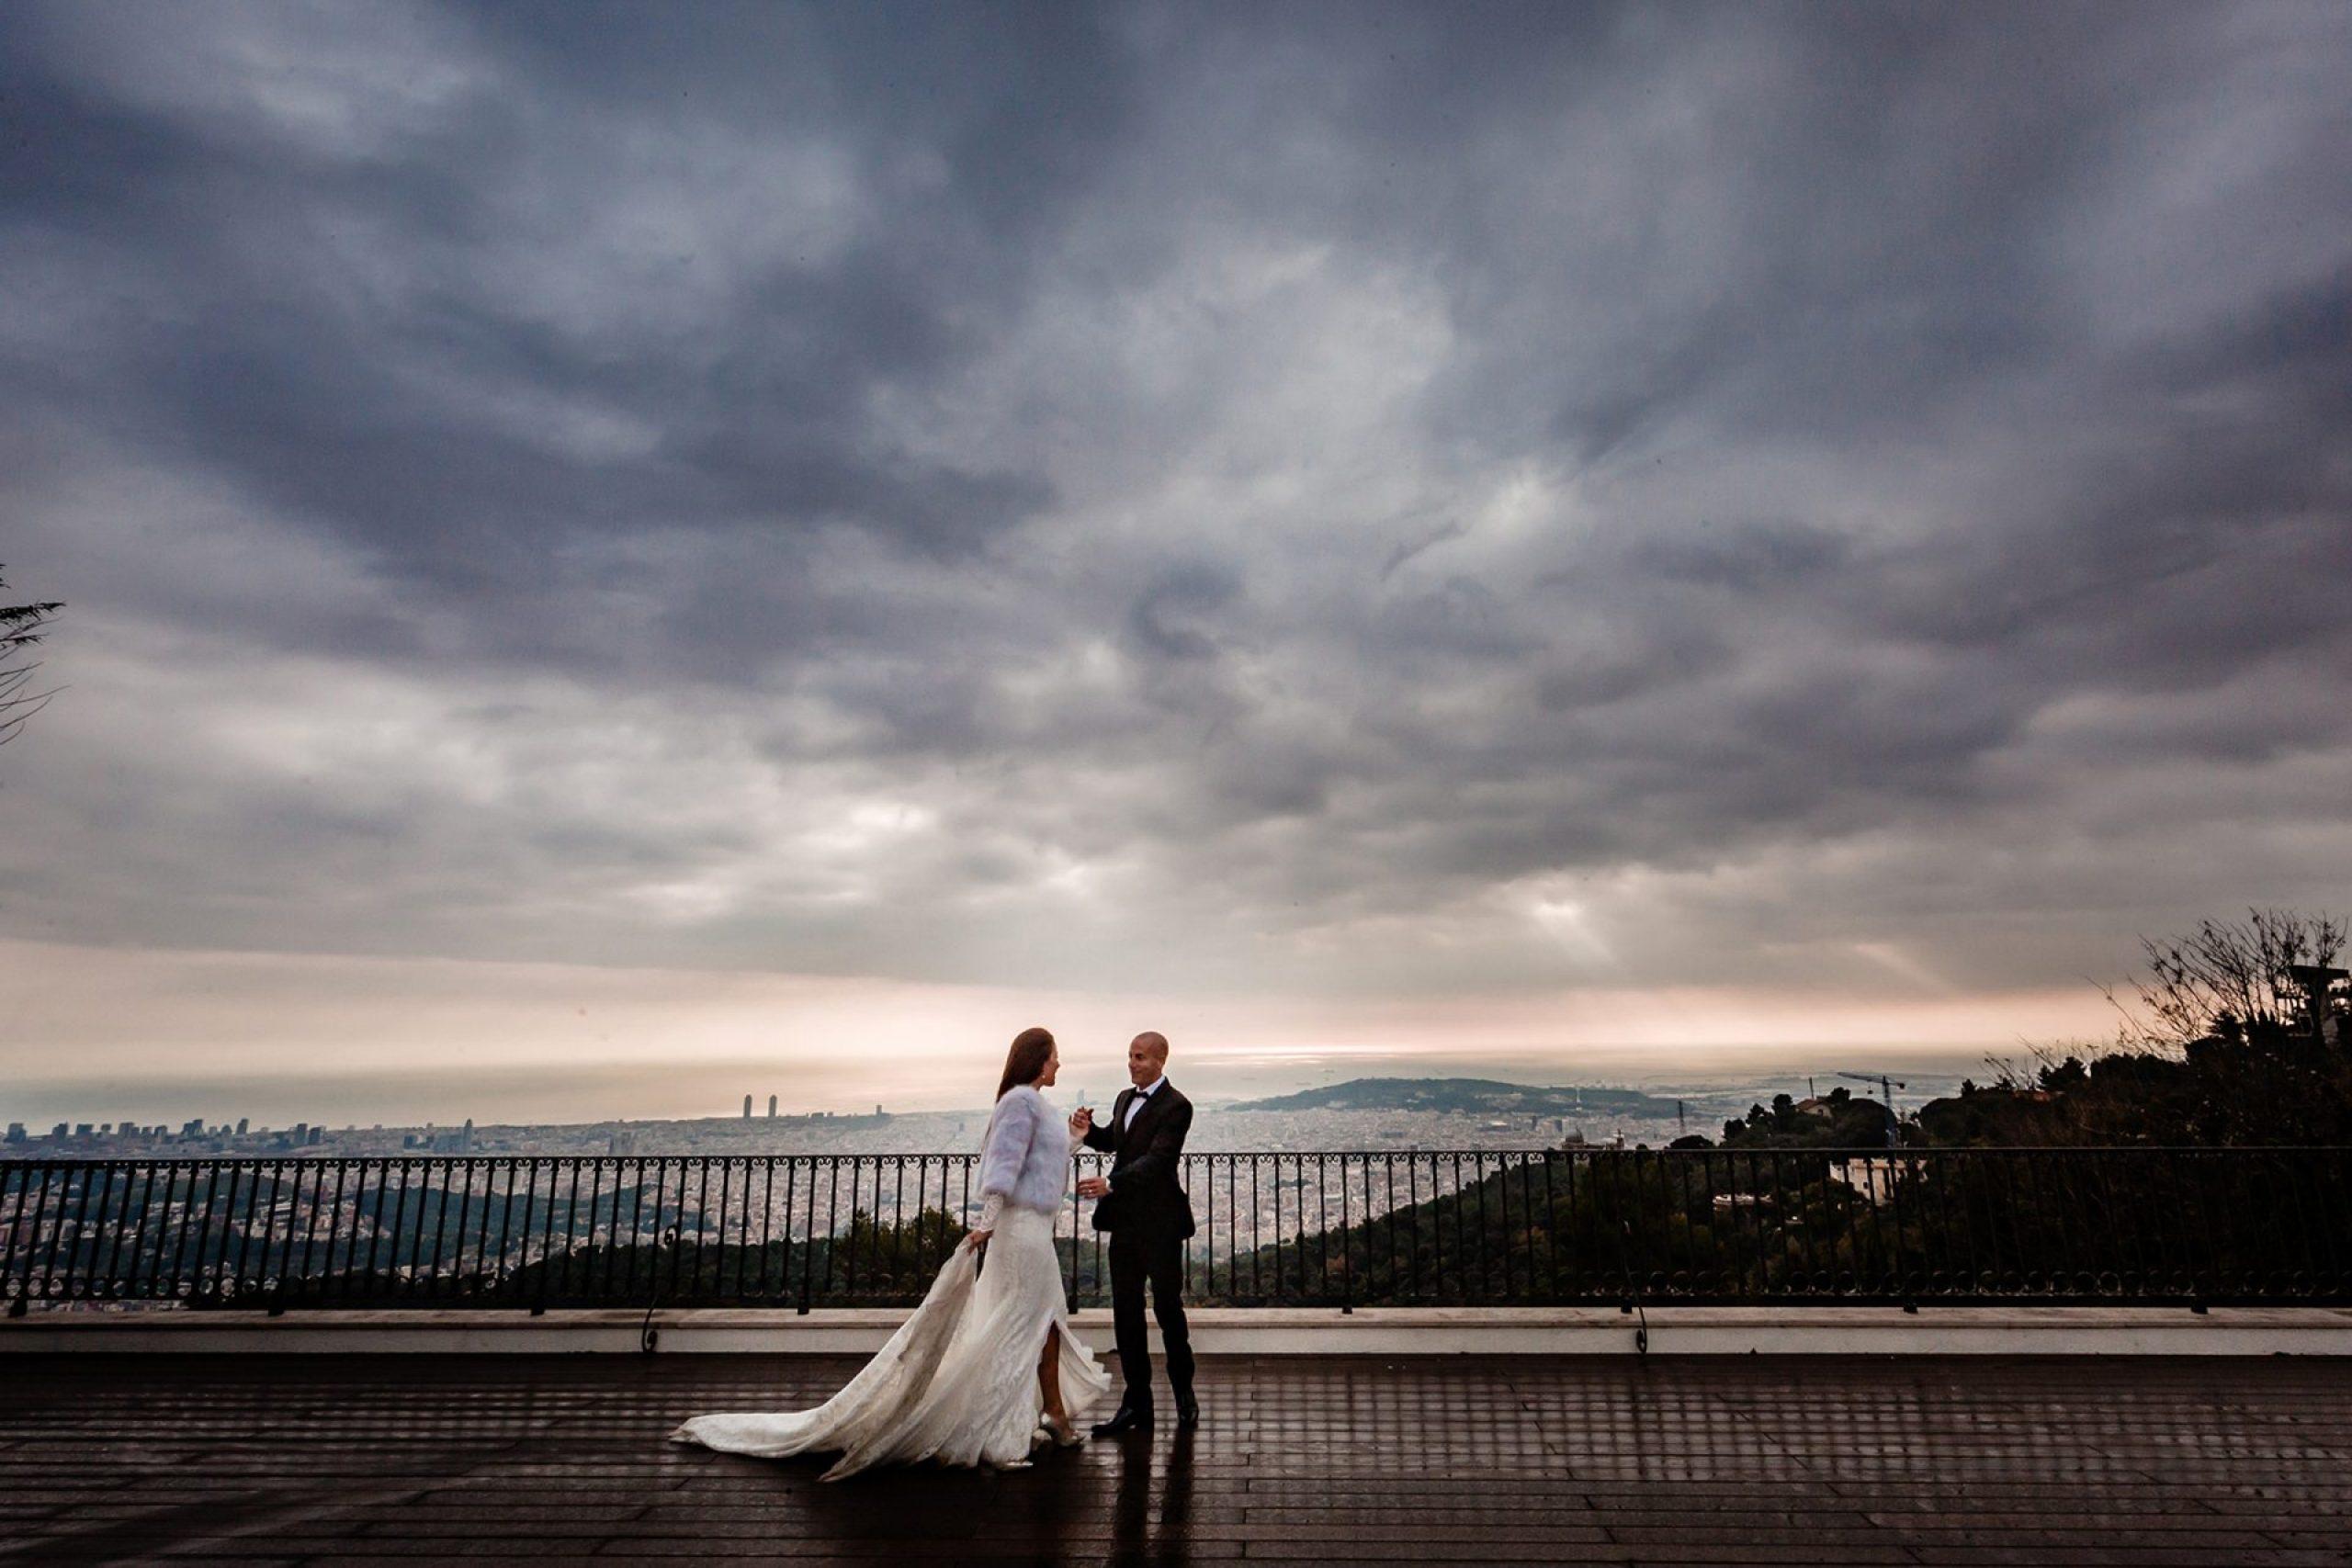 LuzdeBarcelona-postboda-tibidabo-boda-fotografo-Barcelona-27